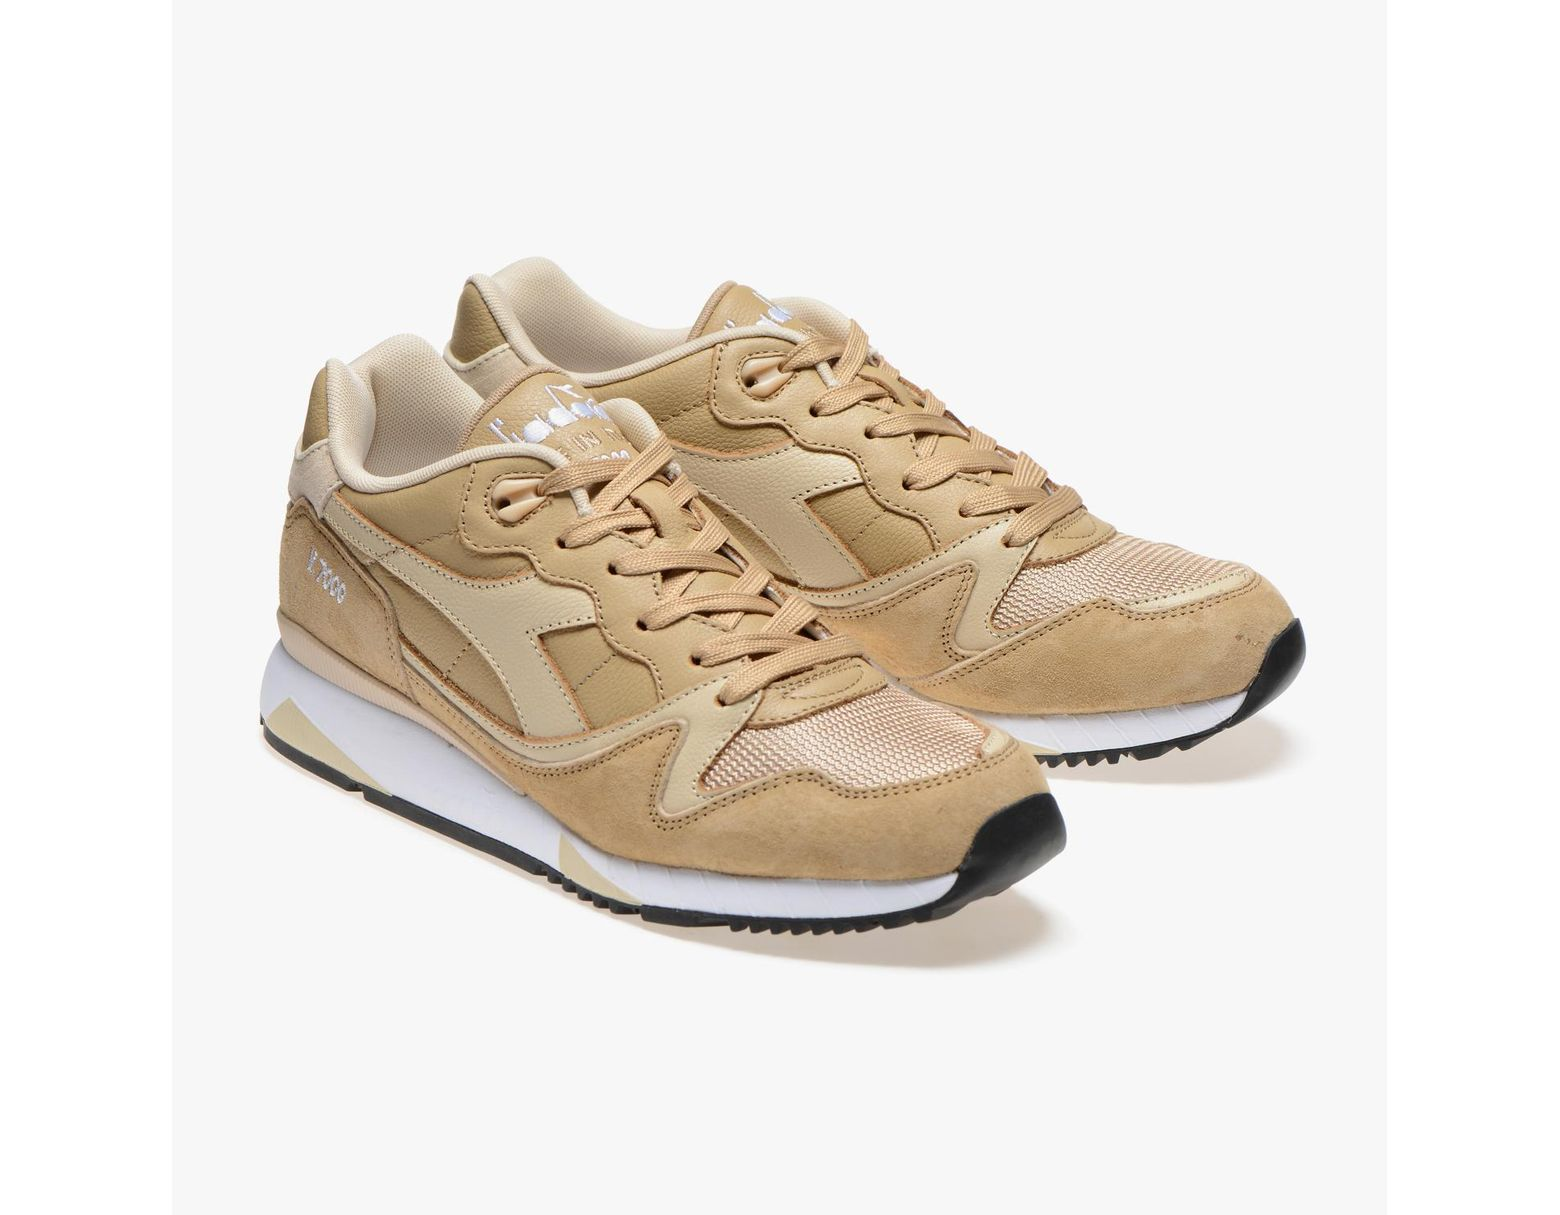 Wn Chaussures De V7000 Nyl Diadora Gy Ii 8nwvmN0